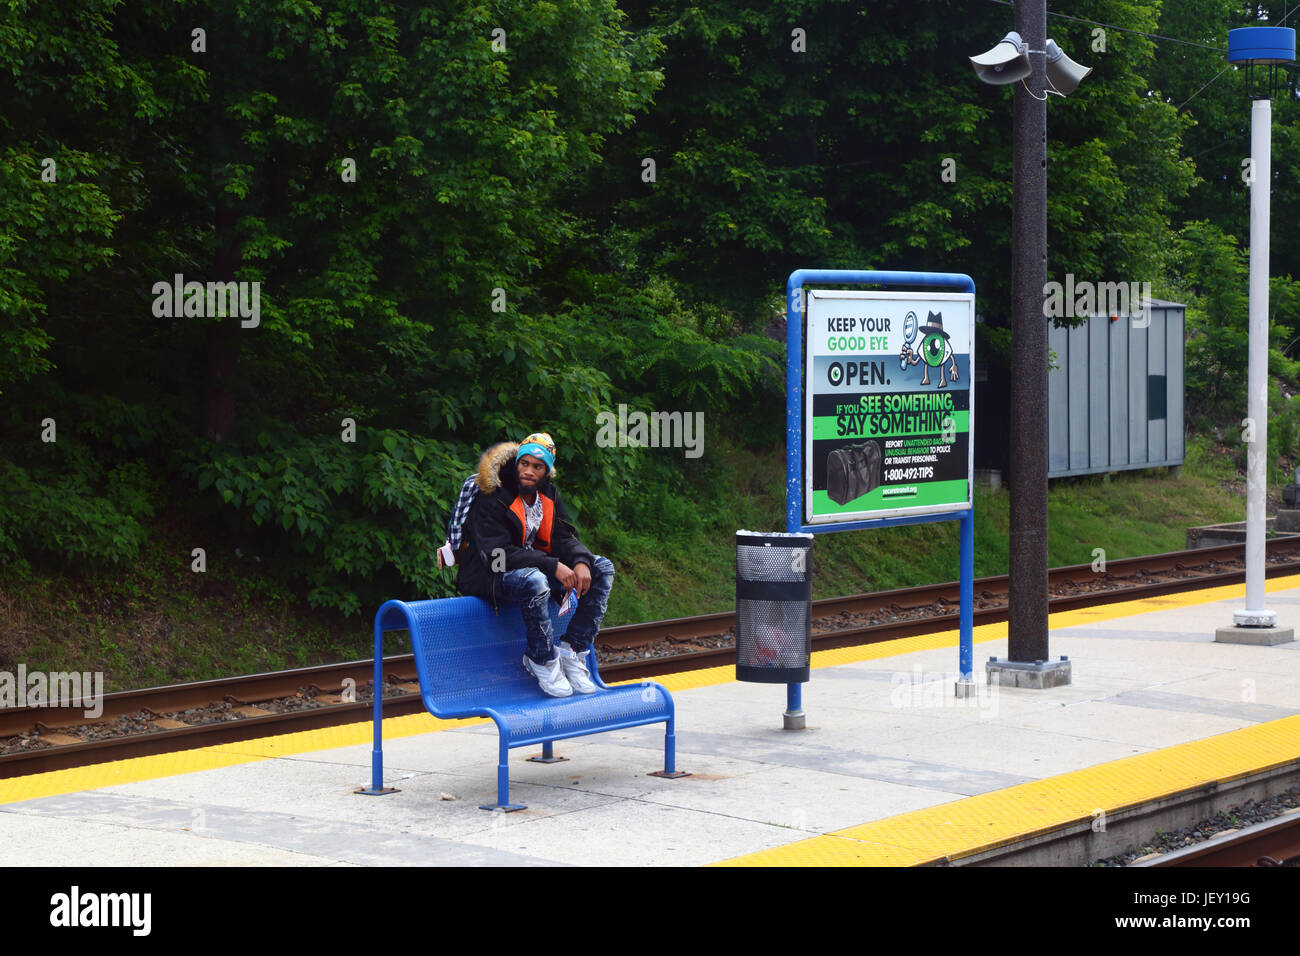 Man sitting on seat next to security billboard on Light Railway station platform, Baltimore, Maryland, USA - Stock Image